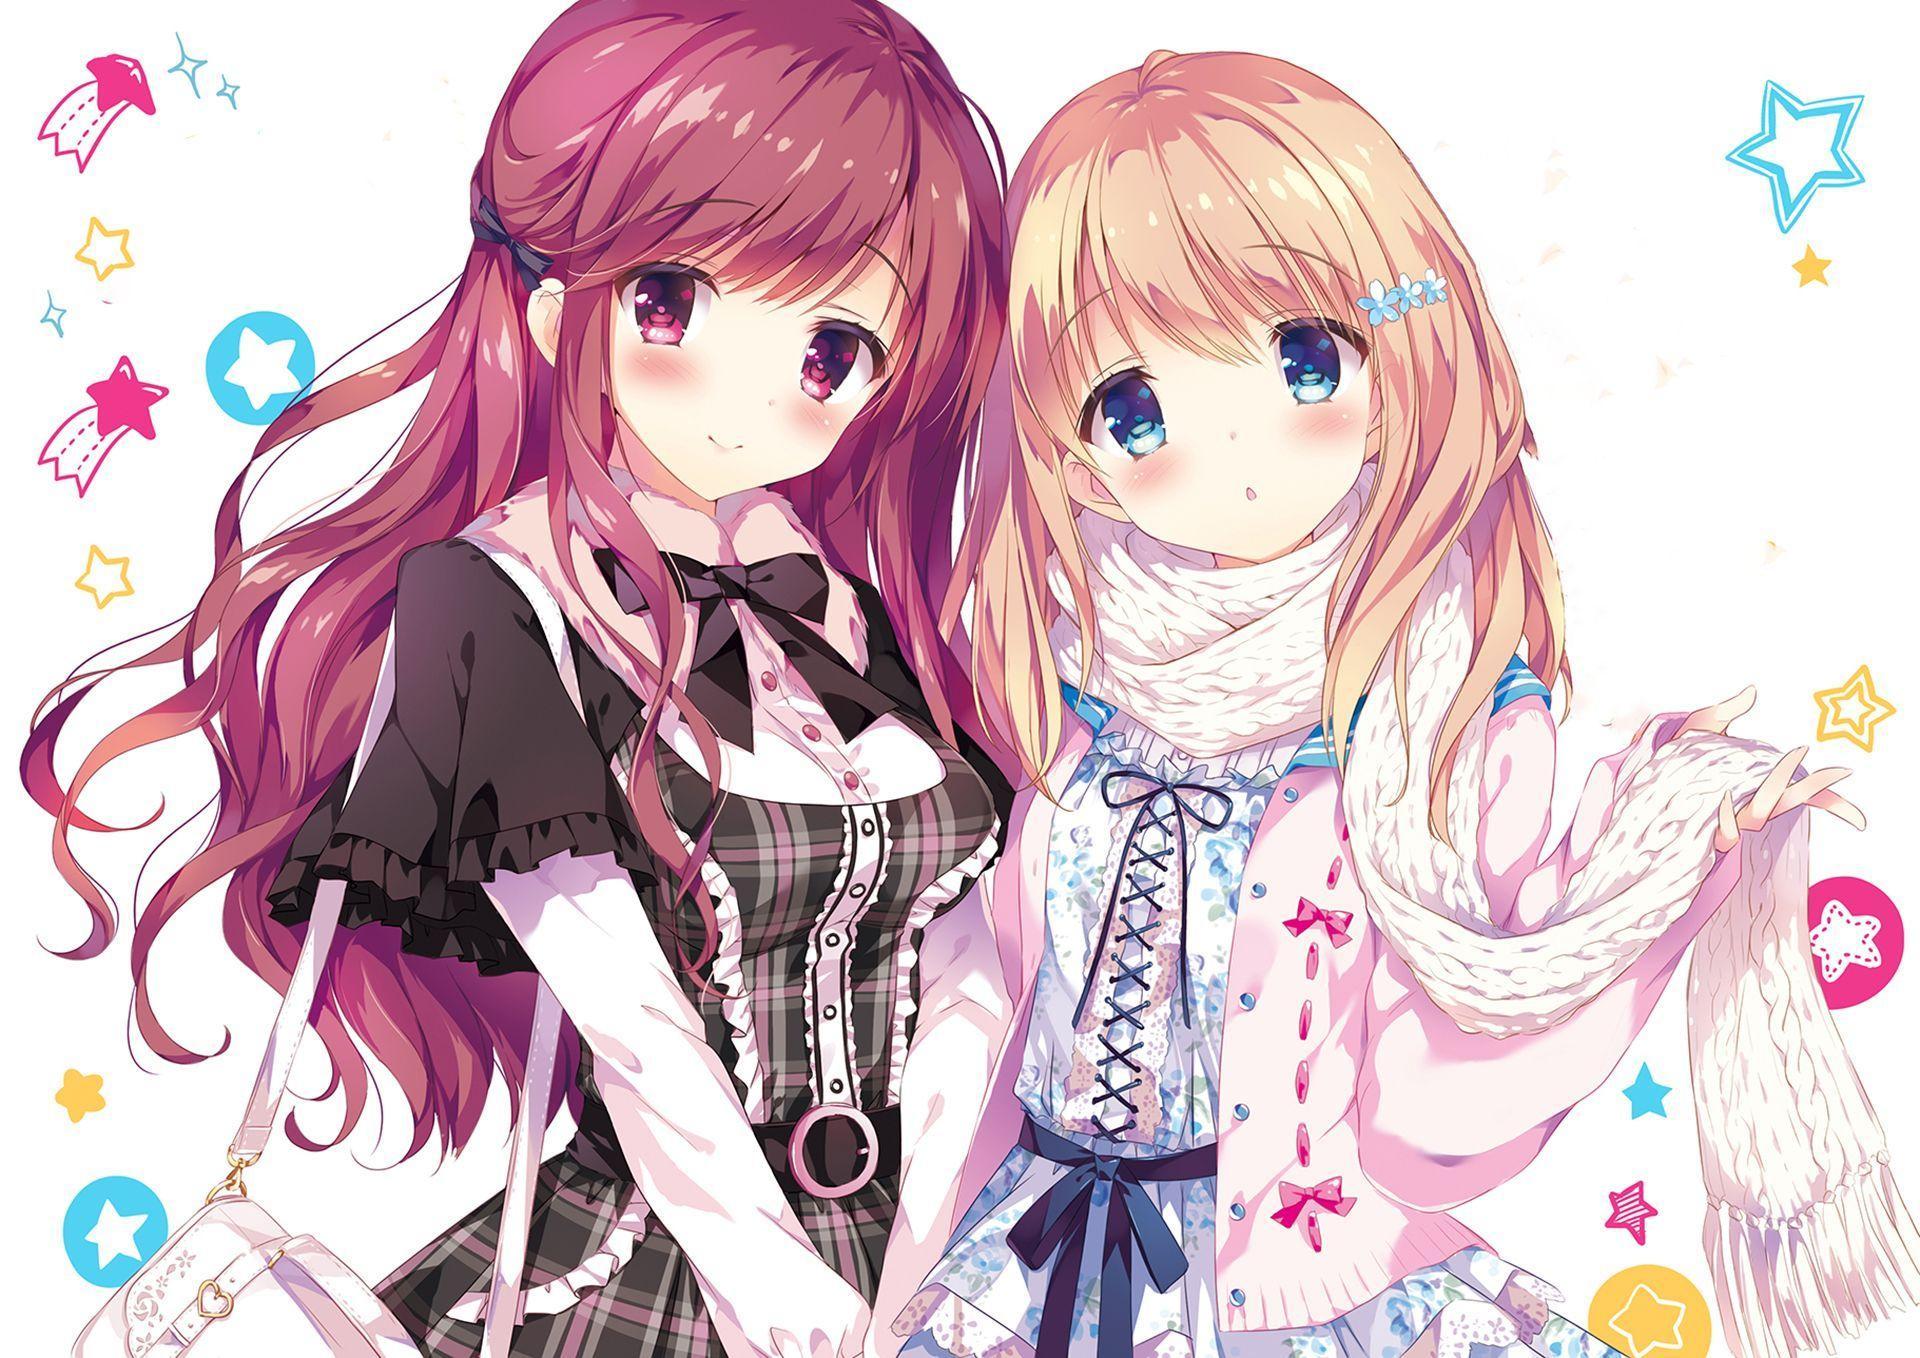 Cute Anime Friends Wallpapers Top Free Cute Anime Friends Backgrounds Wallpaperaccess